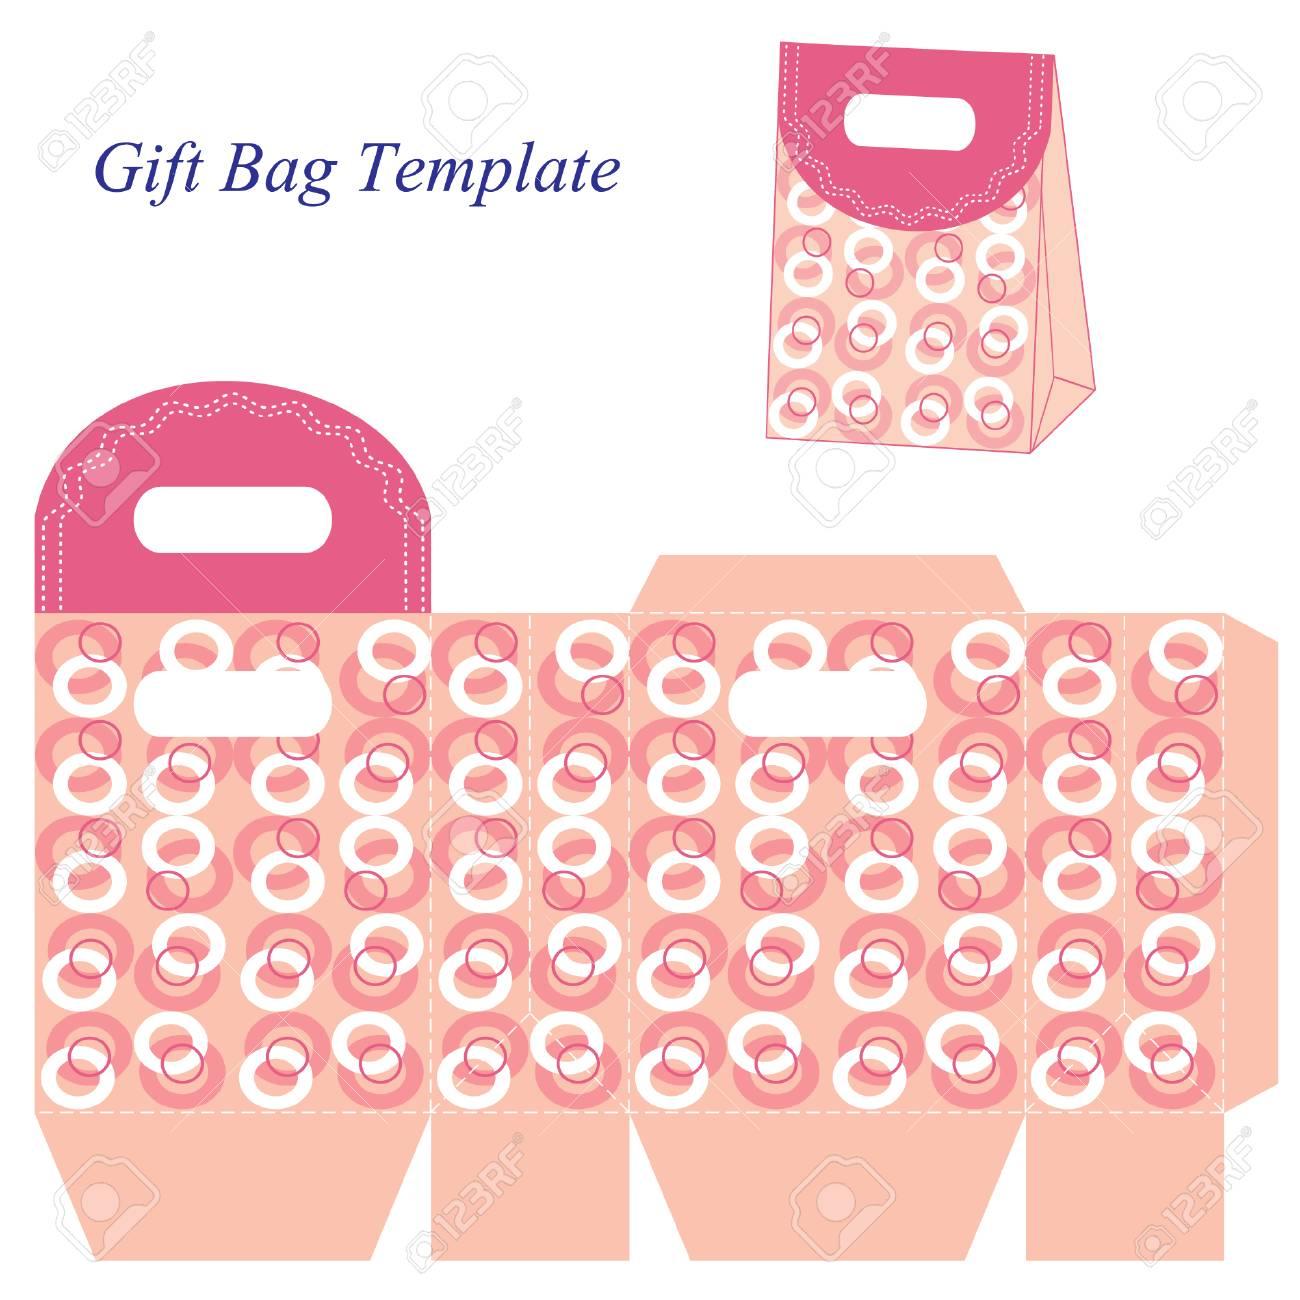 Pink Gift Bag Template With Circles Royalty Free Cliparts, Vectors ...